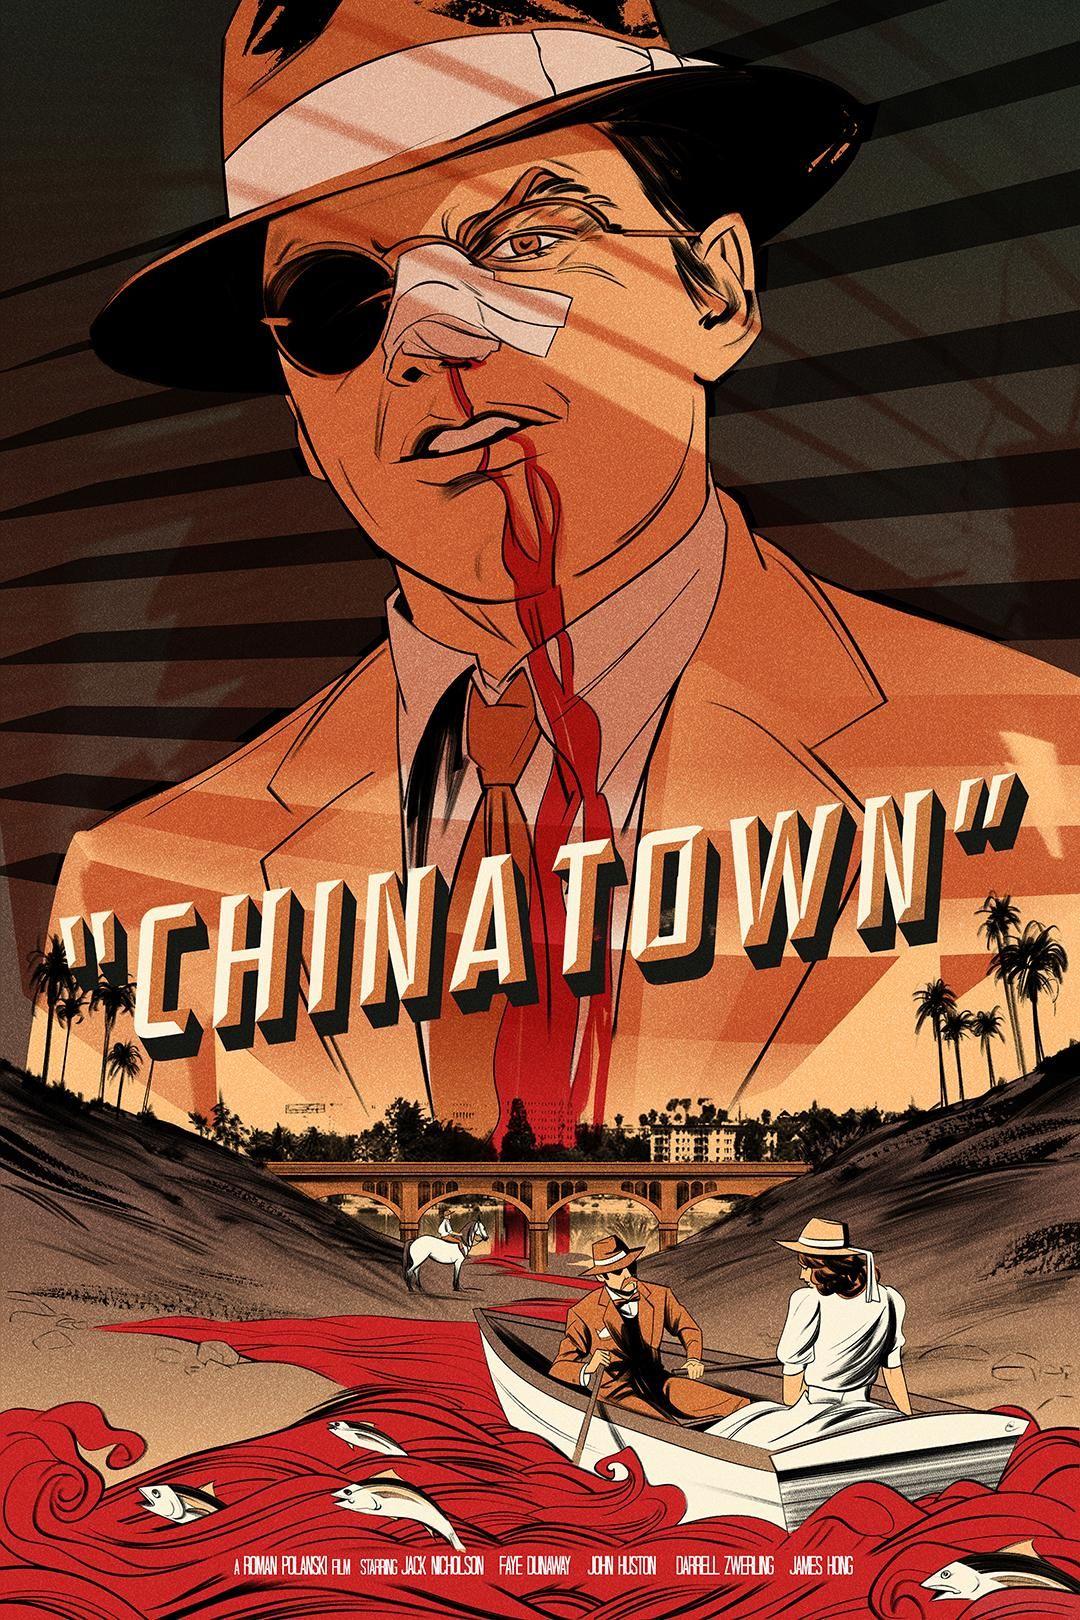 Chinatown 1974 1080 X 1620 Movie Poster Art Movie Artwork Movie Posters